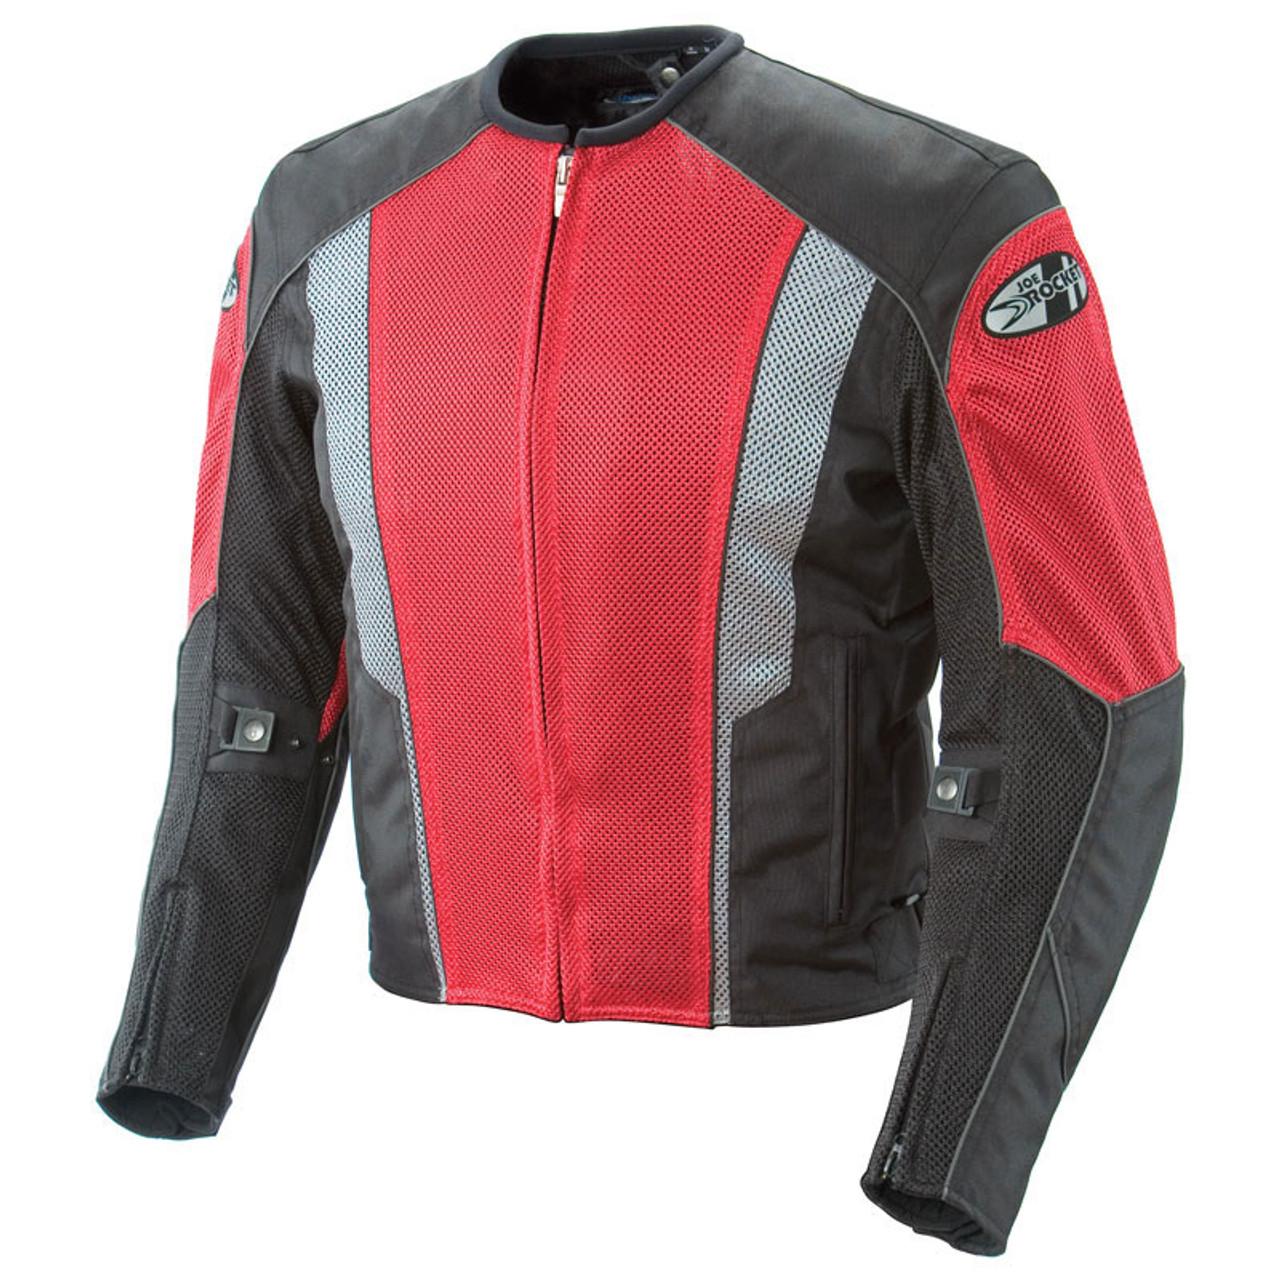 Joe Rocket Phoenix 5 0 Mesh Jacket Red Black